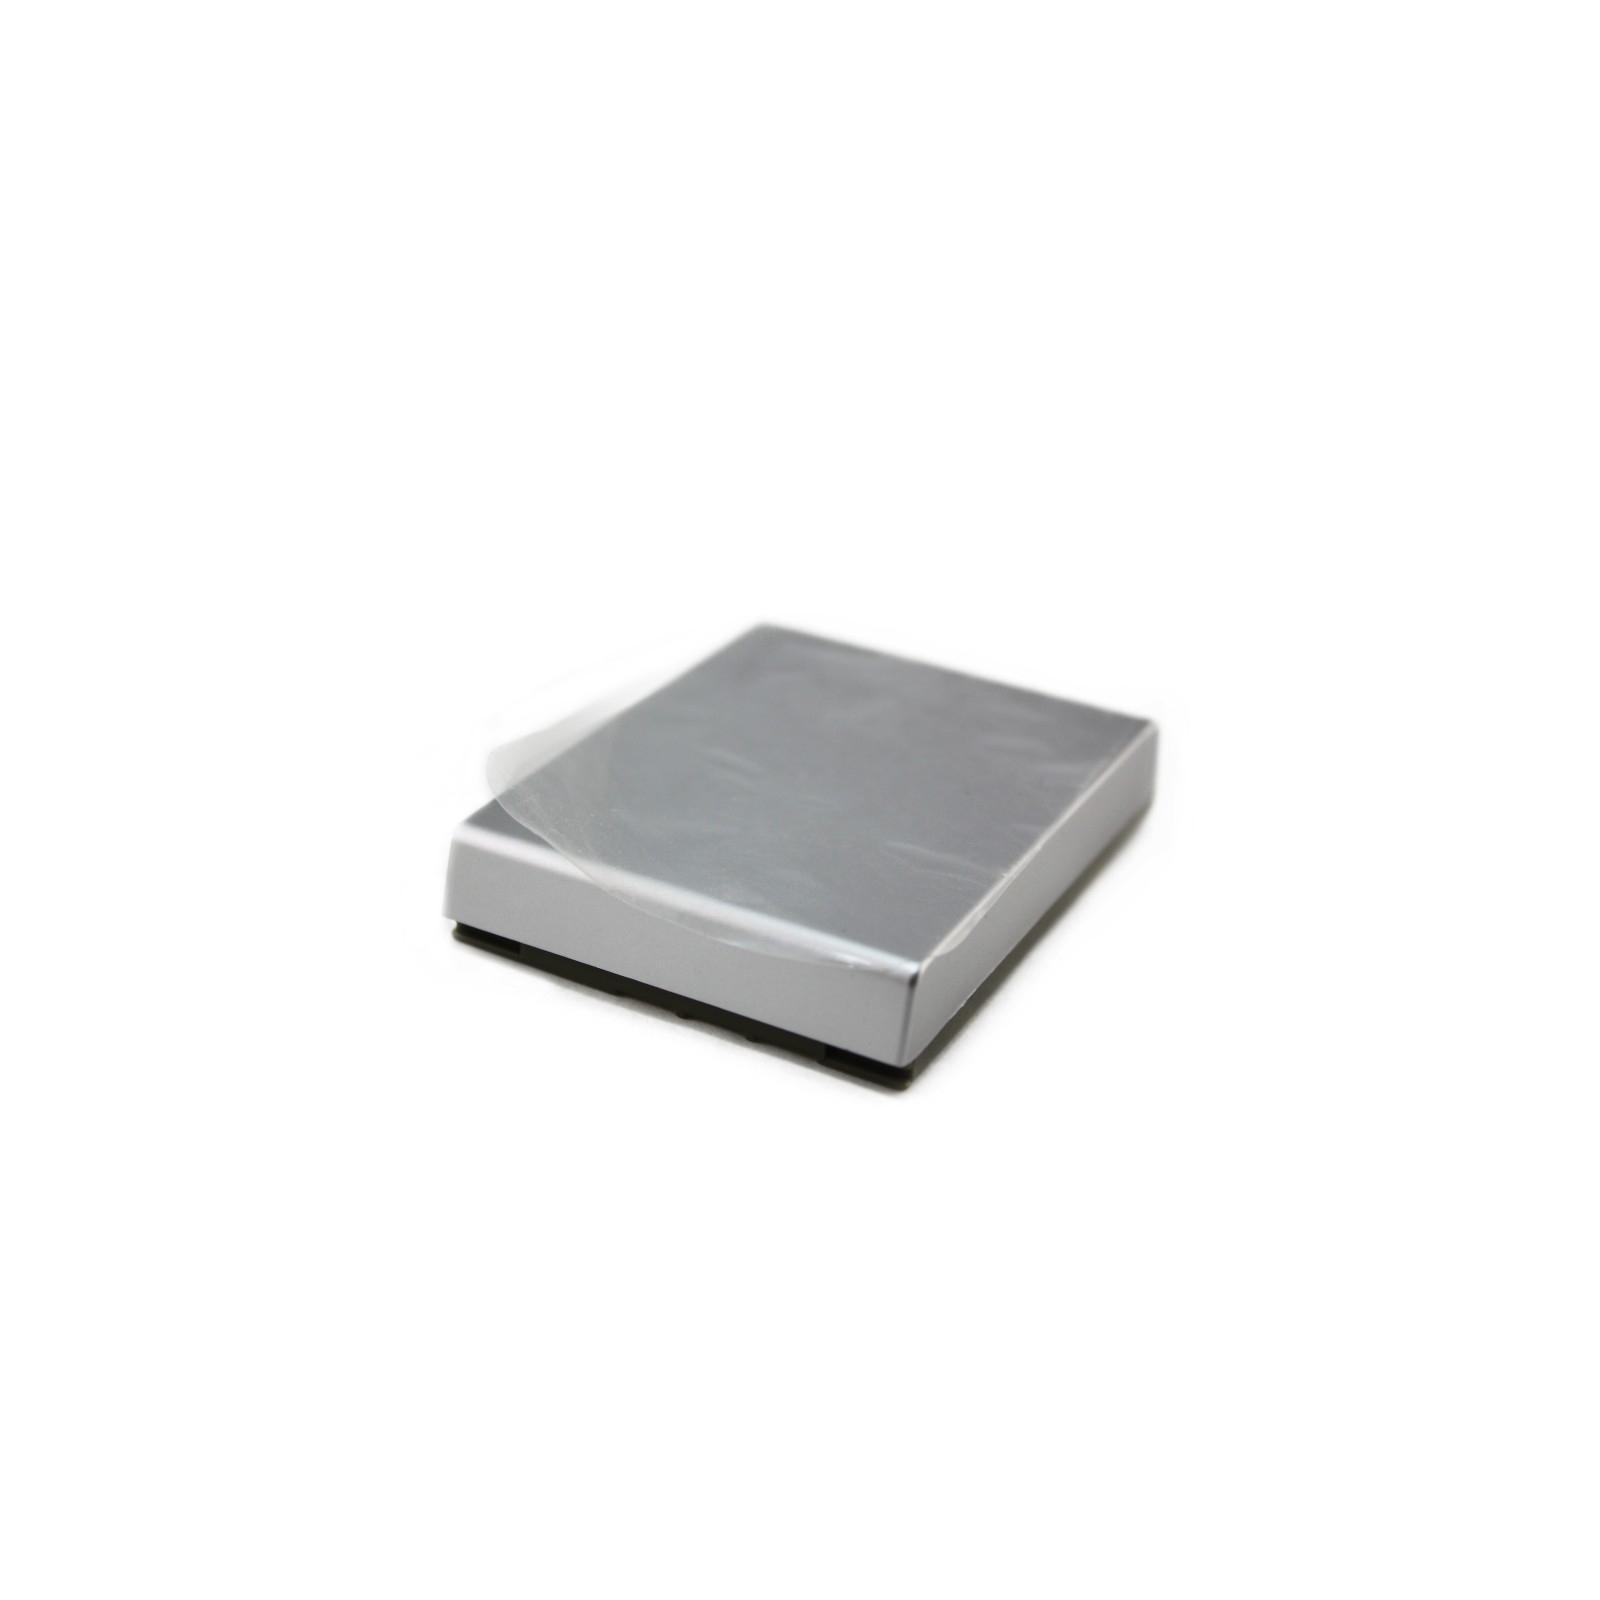 Аккумулятор к фото/видео EXTRADIGITAL JVC BN-V114U (DV00DV1087) изображение 5